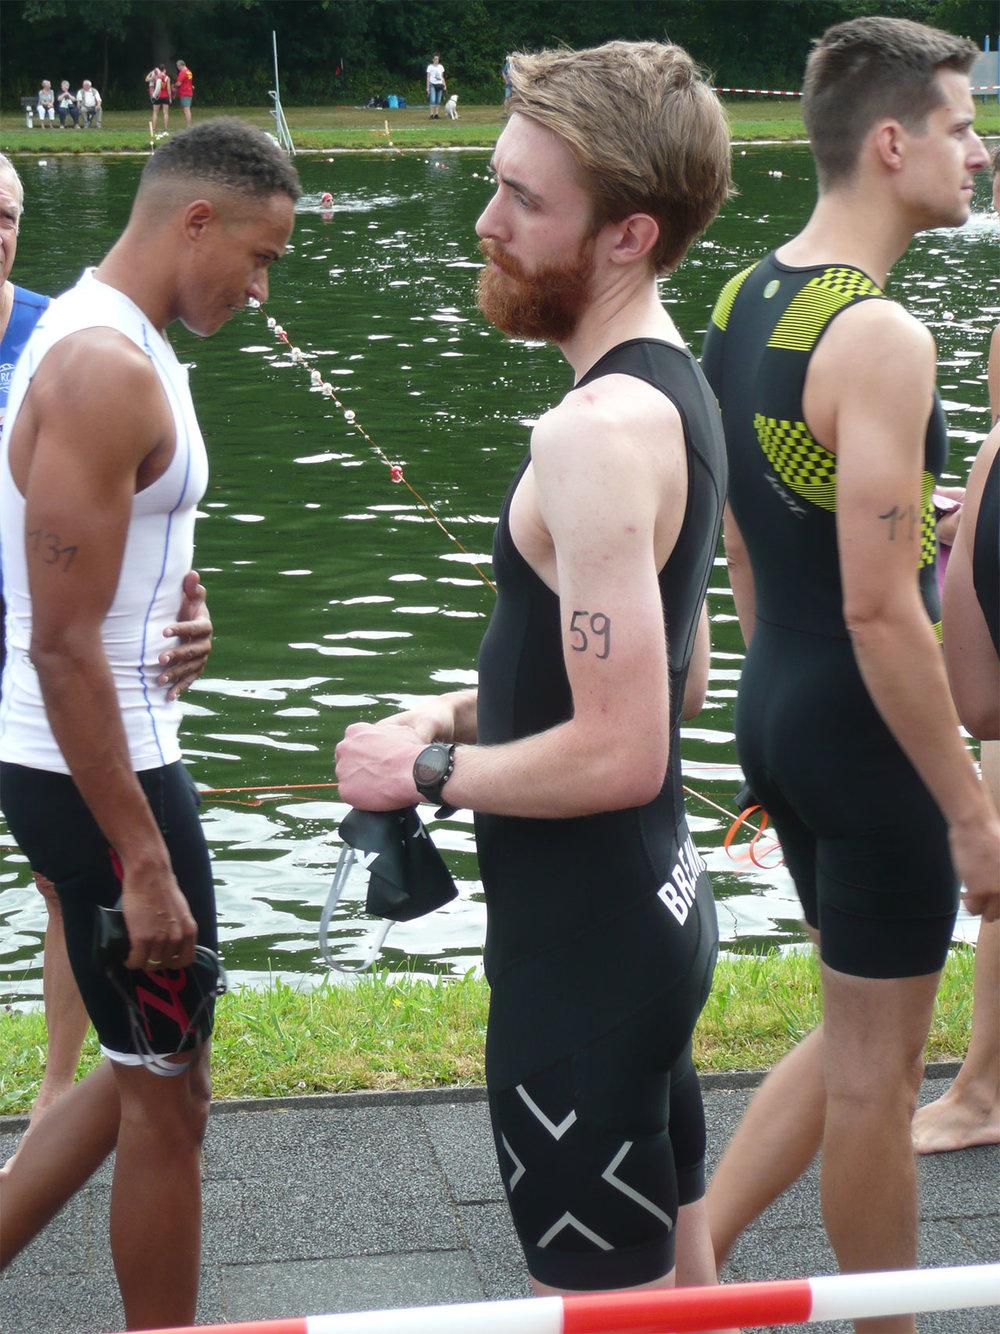 Muesen_Triathlon.jpg